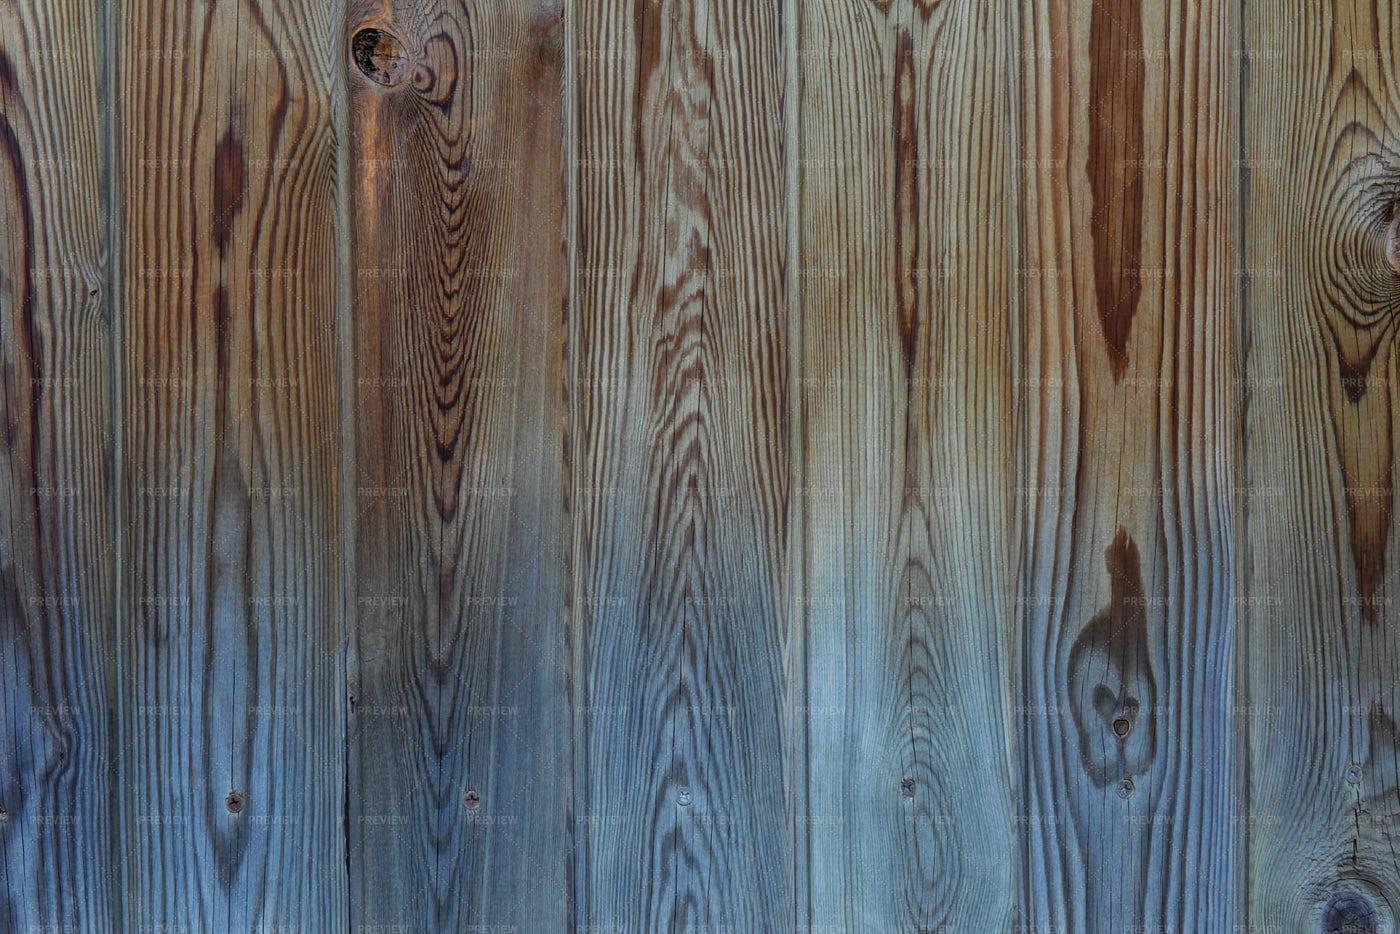 Wooden Gradient Background: Stock Photos